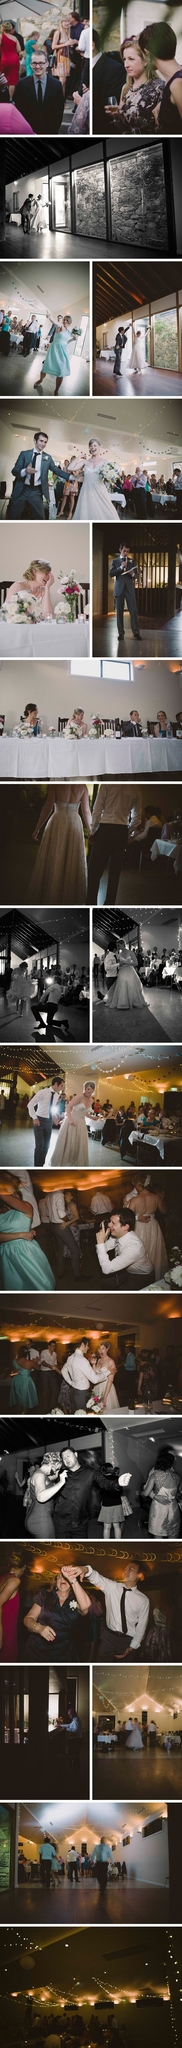 Rustic Grazing Gundaroo Wedding Photos